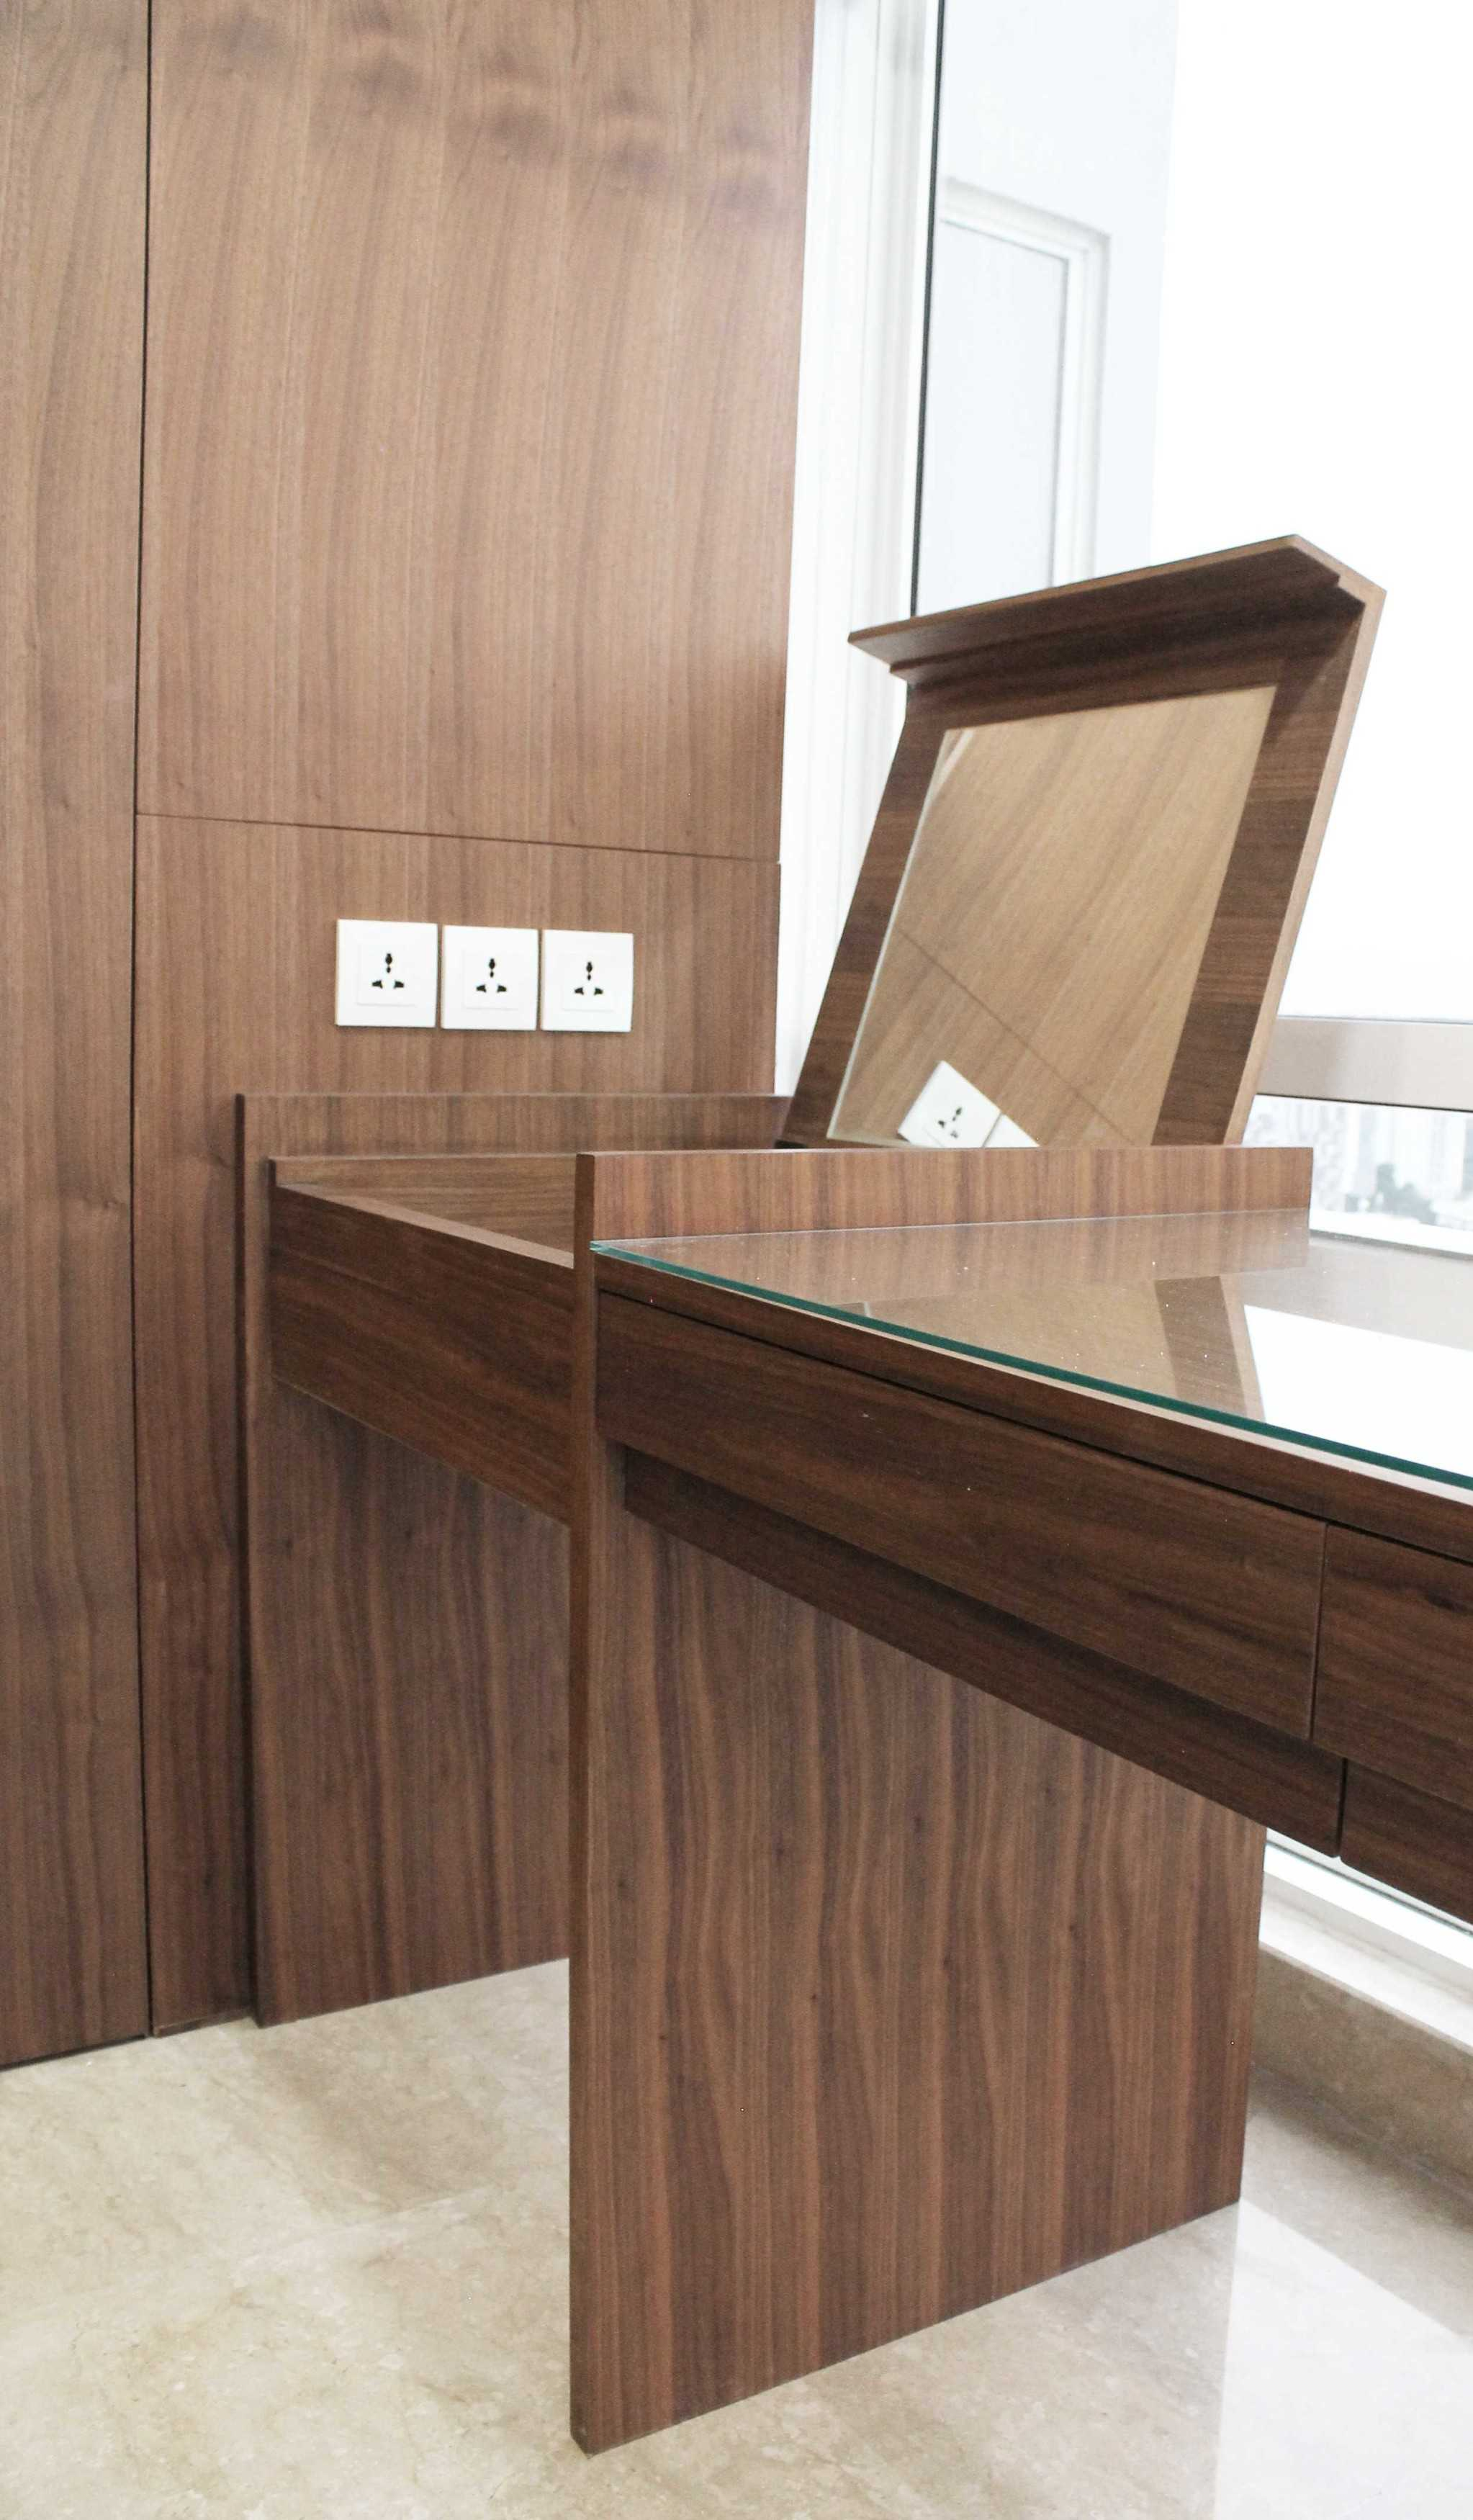 Jakarta Design Rush Apartment At Menteng Park Jakarta, Daerah Khusus Ibukota Jakarta, Indonesia Jakarta, Daerah Khusus Ibukota Jakarta, Indonesia Jakarta-Design-Rush-Apartment-At-Menteng-Park   90852